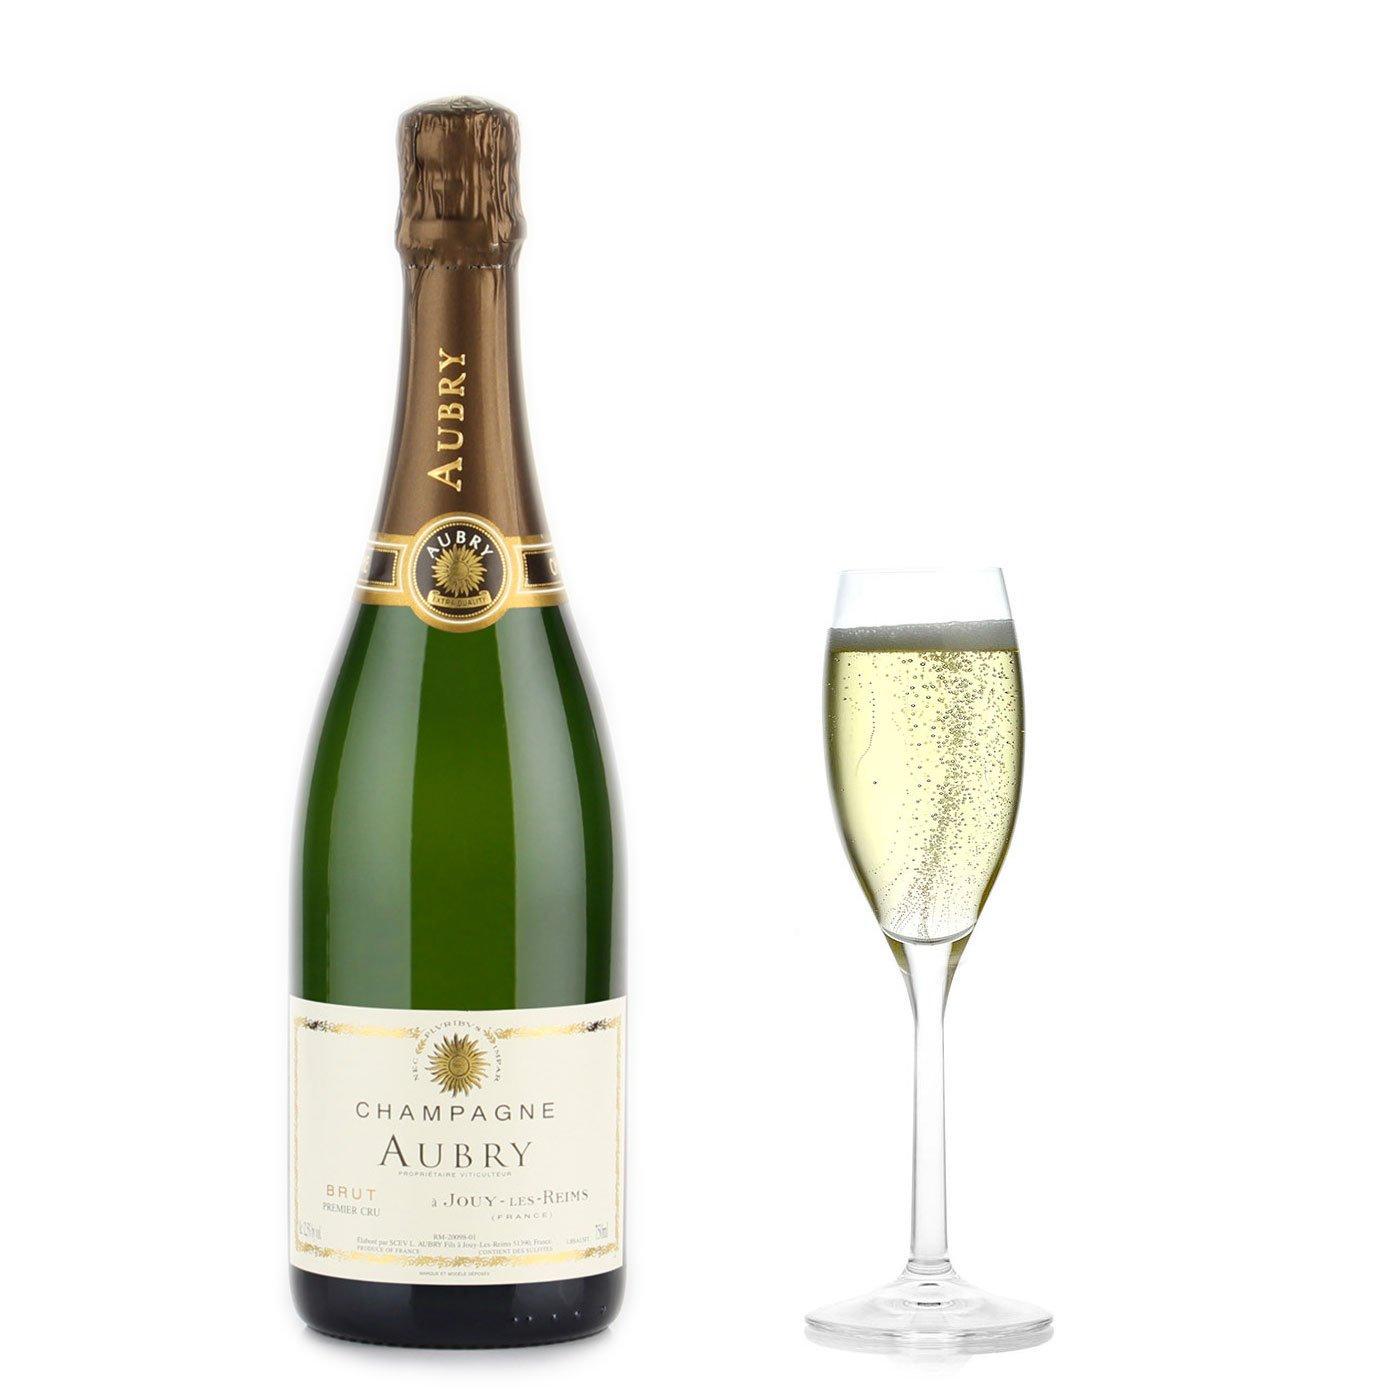 Champagne Per Bottle